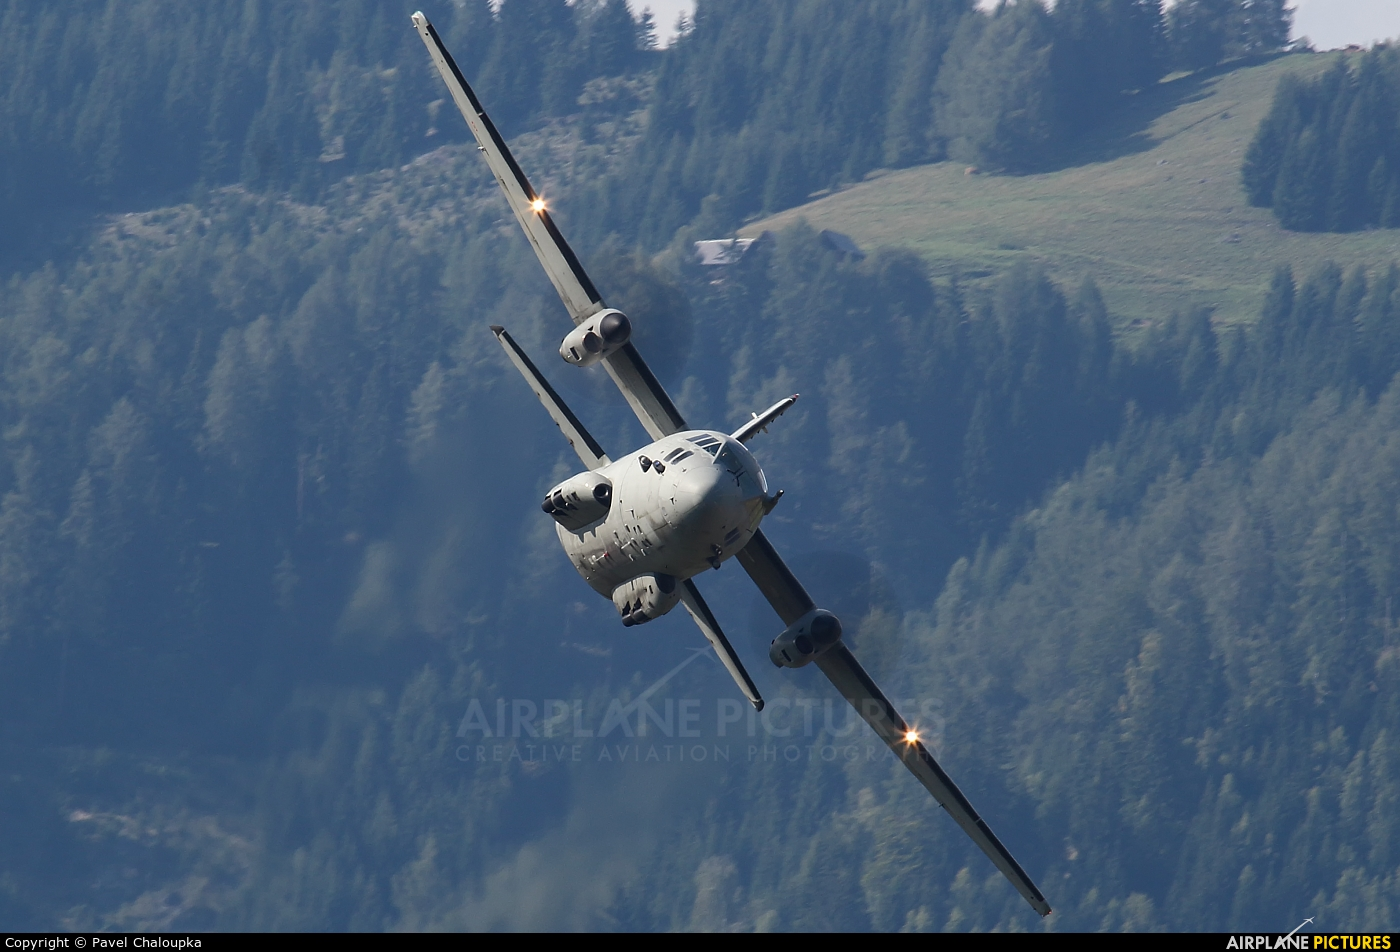 Italy - Air Force MM62215 aircraft at Zeltweg